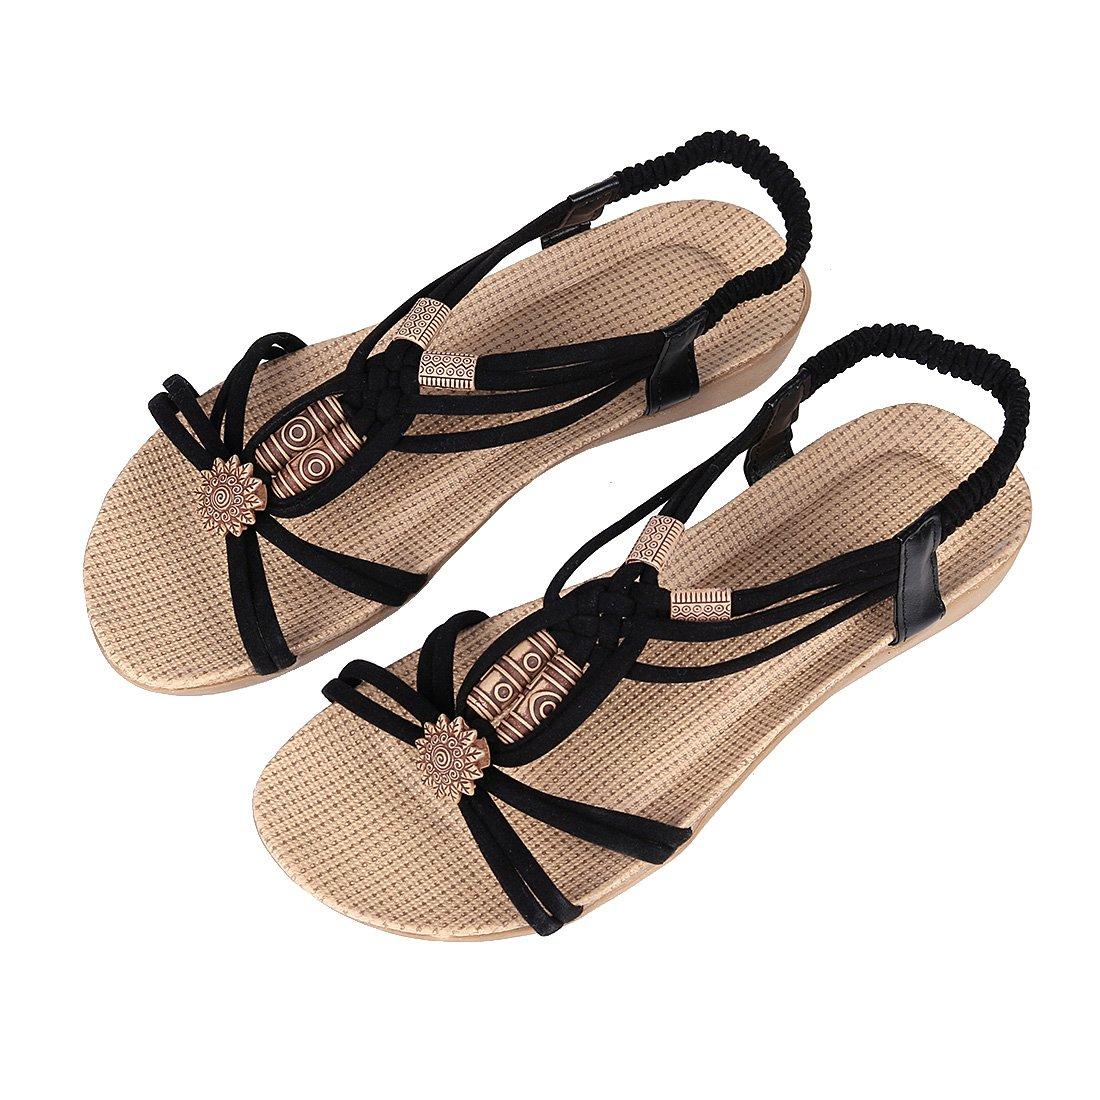 Women's Vintage Flat Sandal Summer Beach Peep Toe Strap Sandals H42